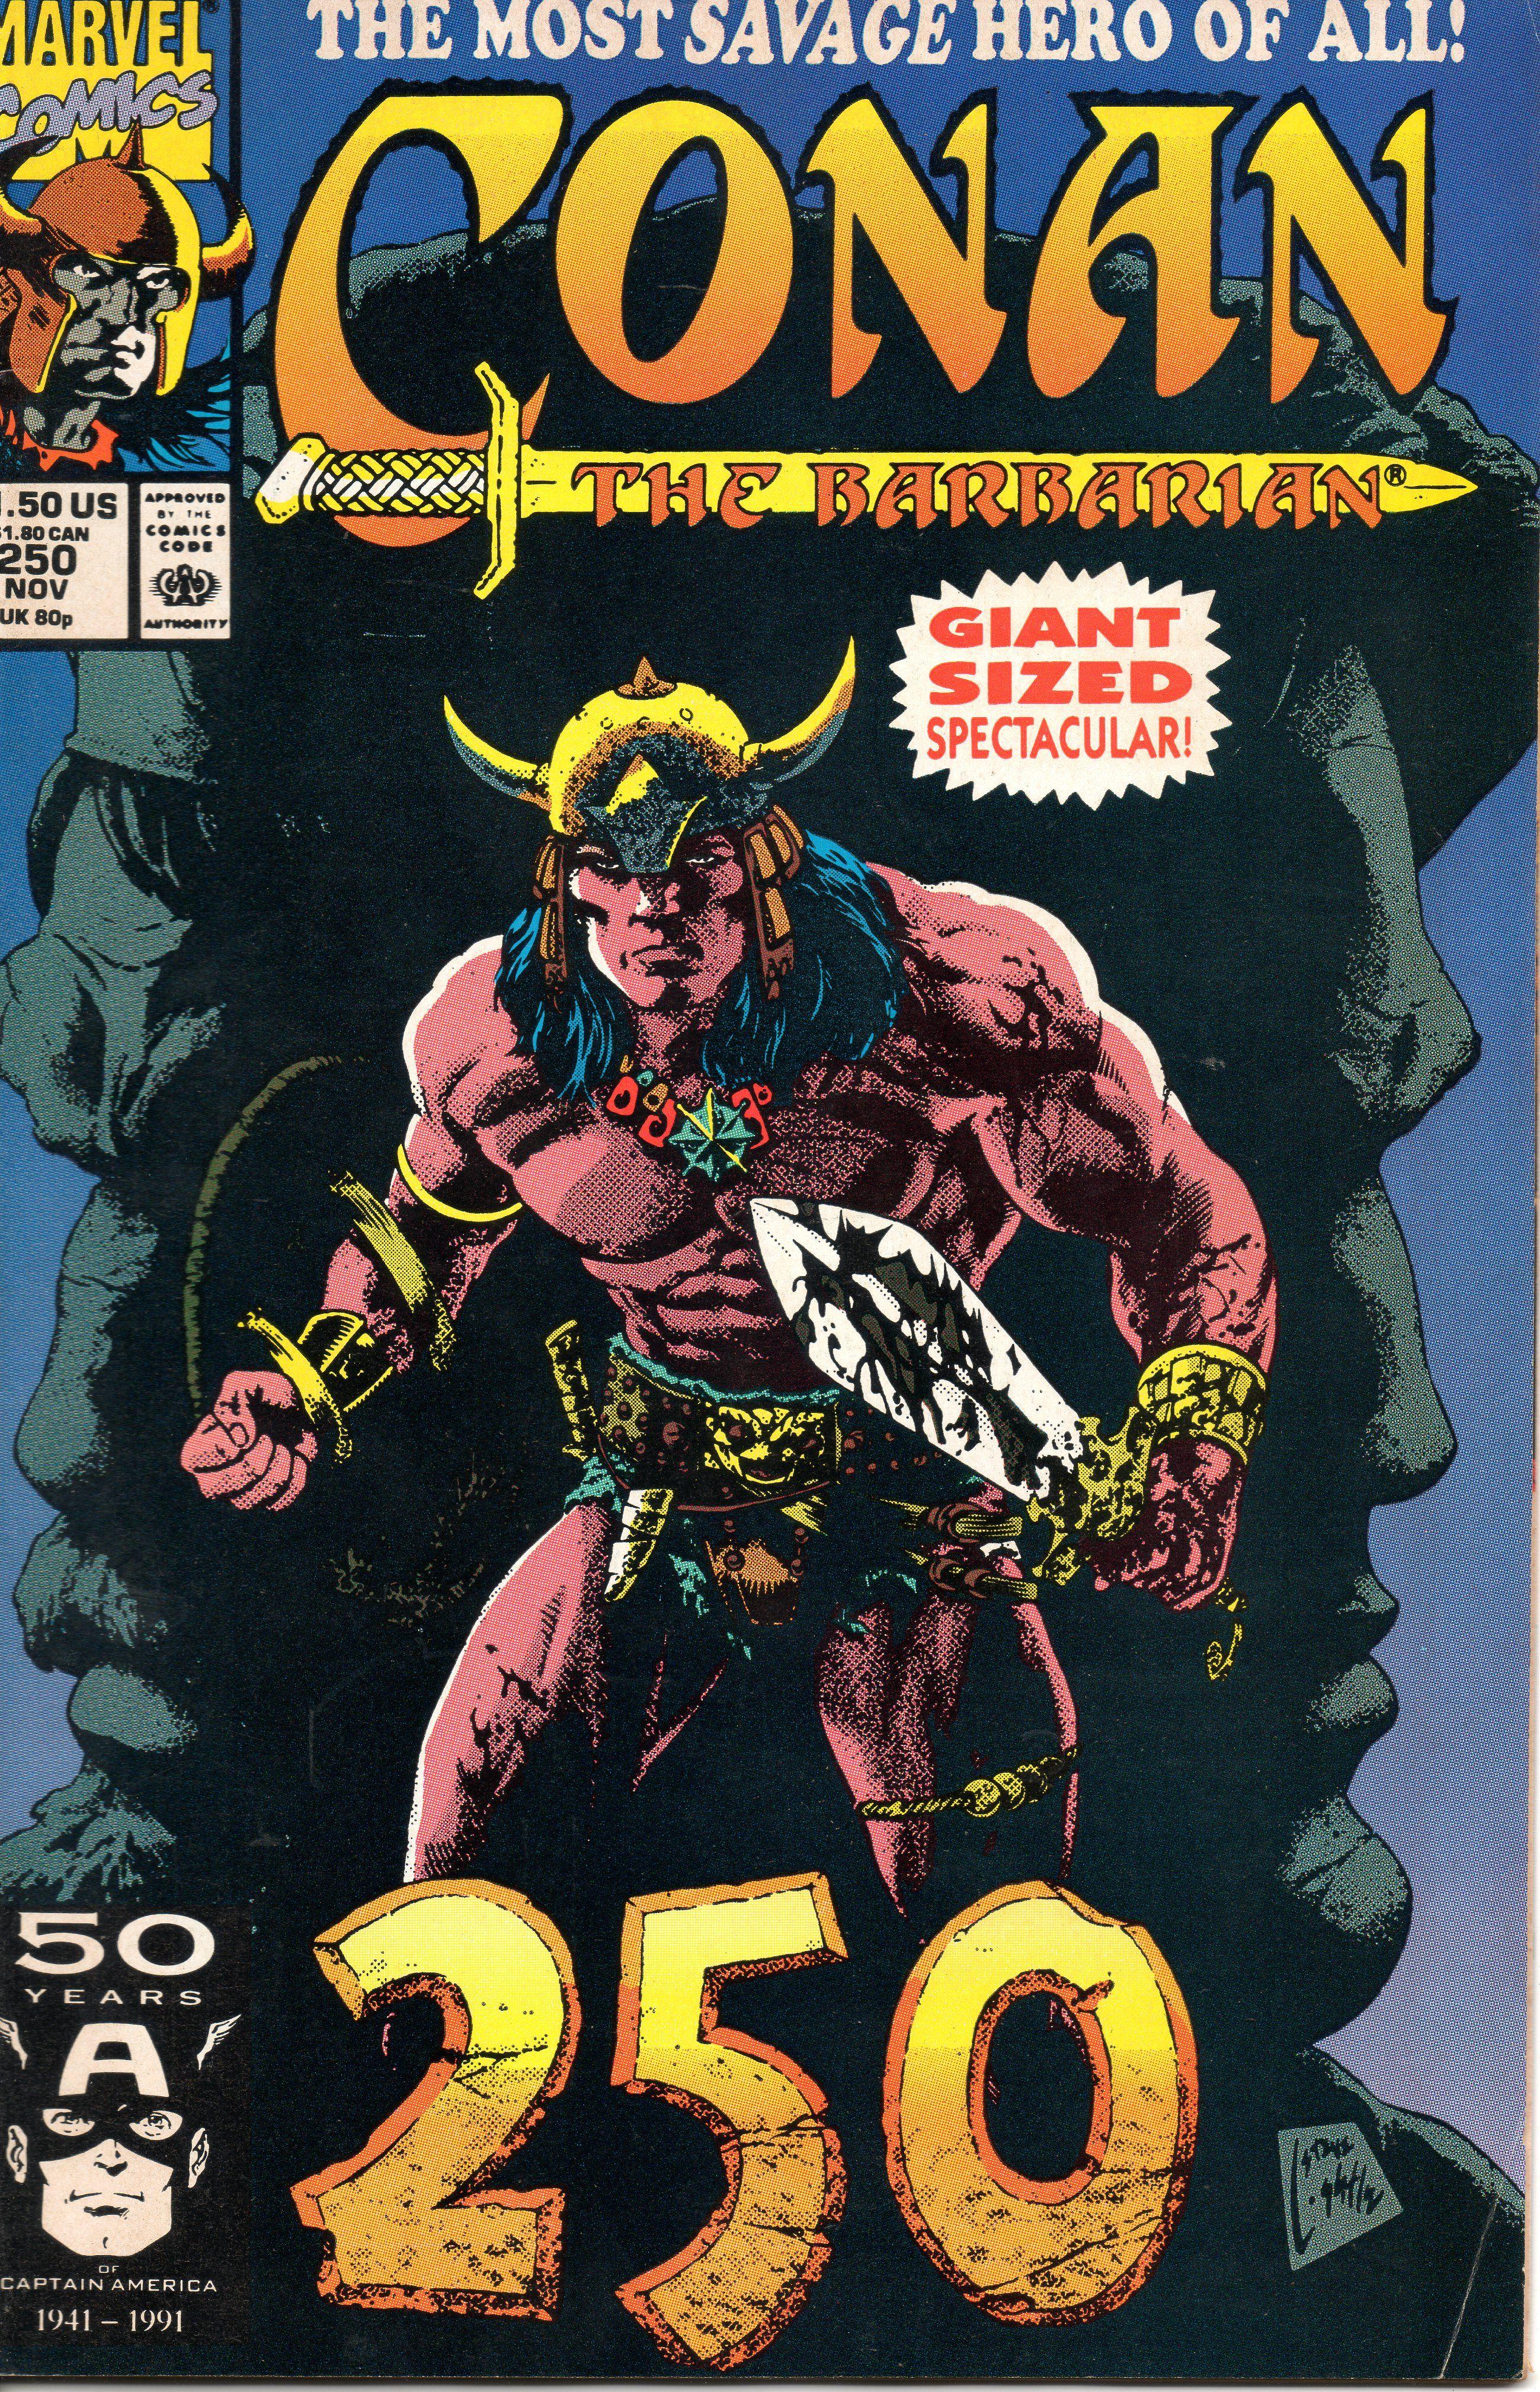 Conan The Barbarian #250.